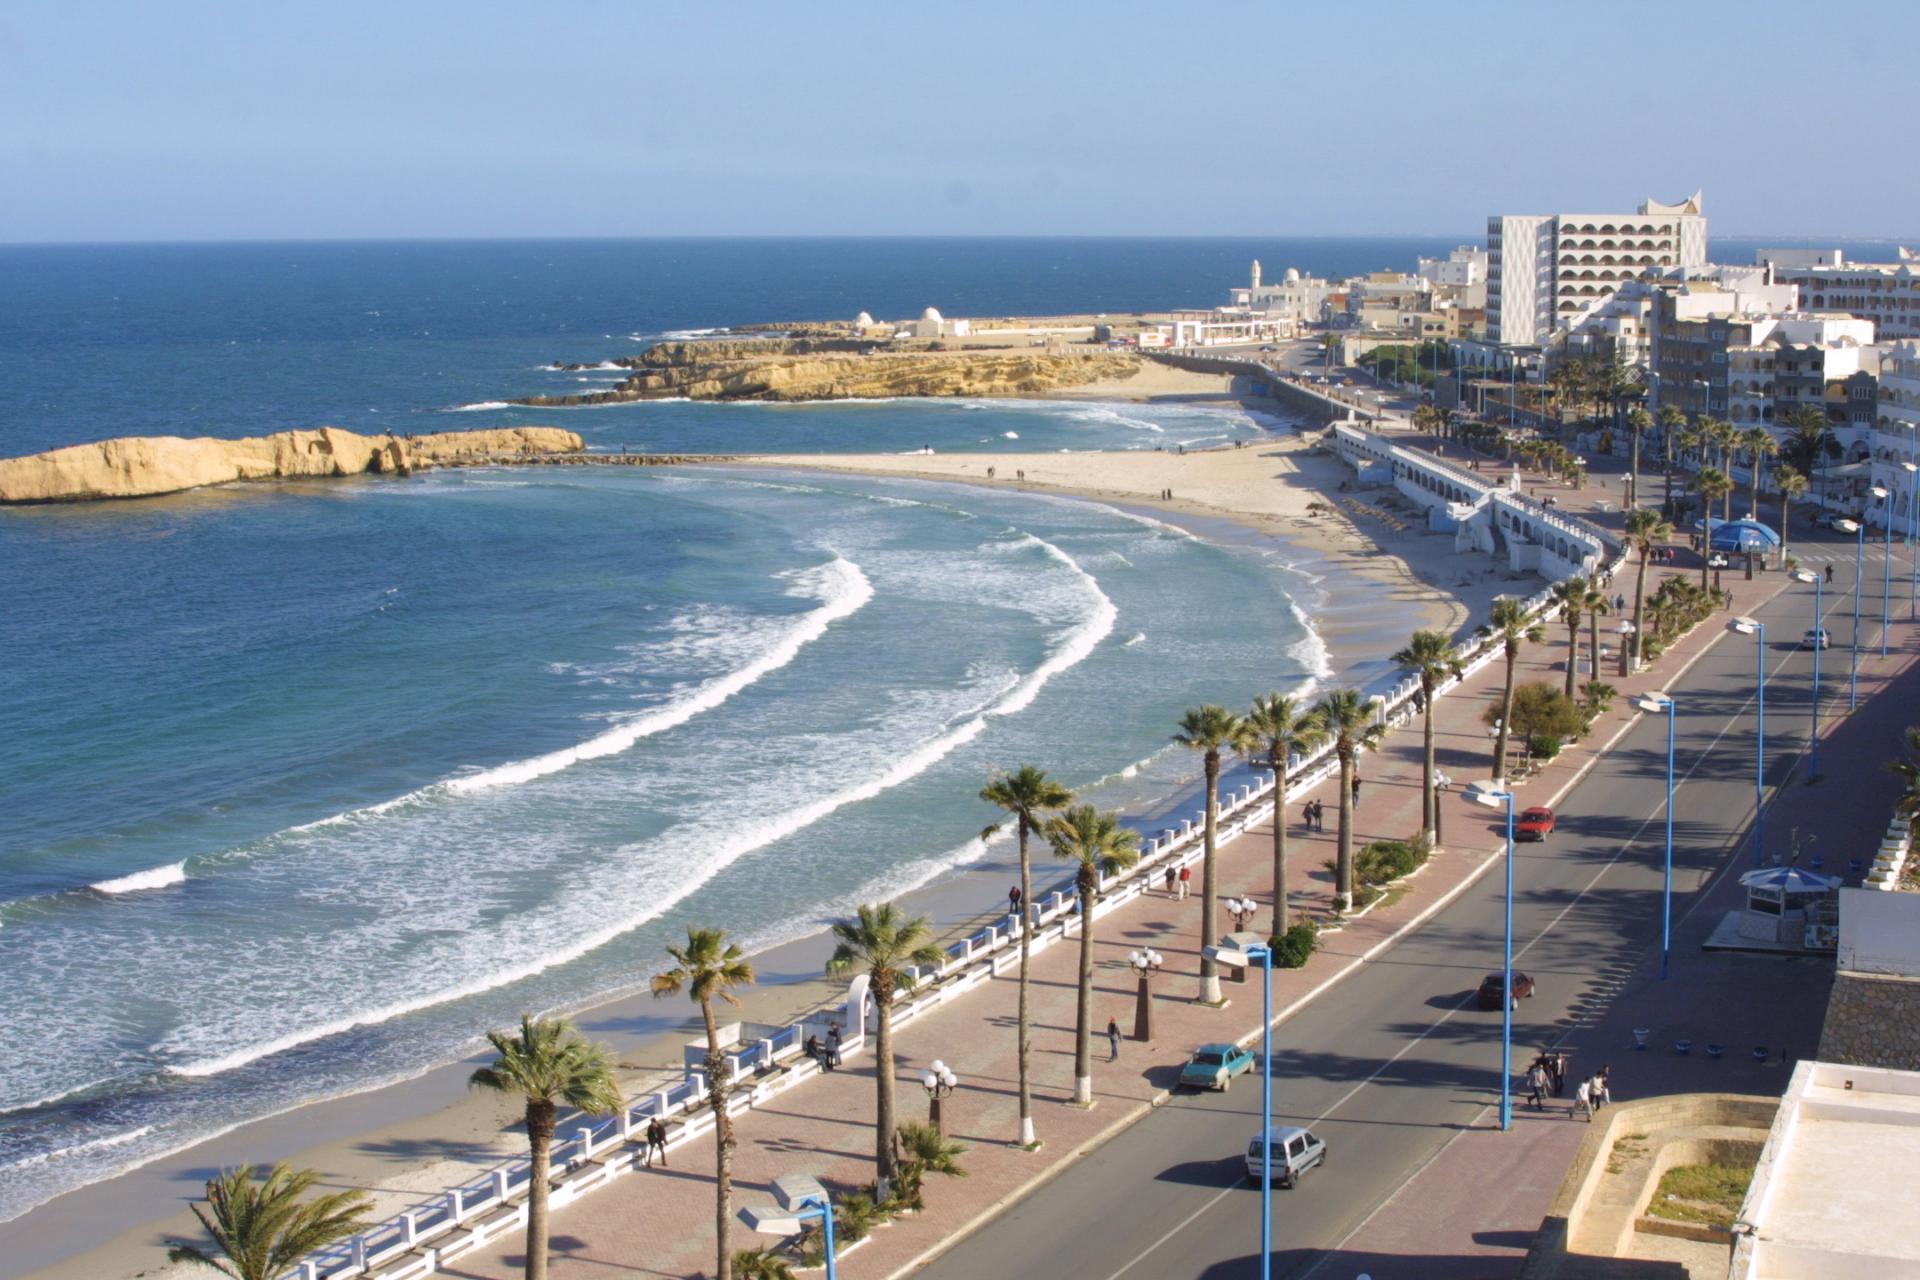 La plage Al Qurayyah